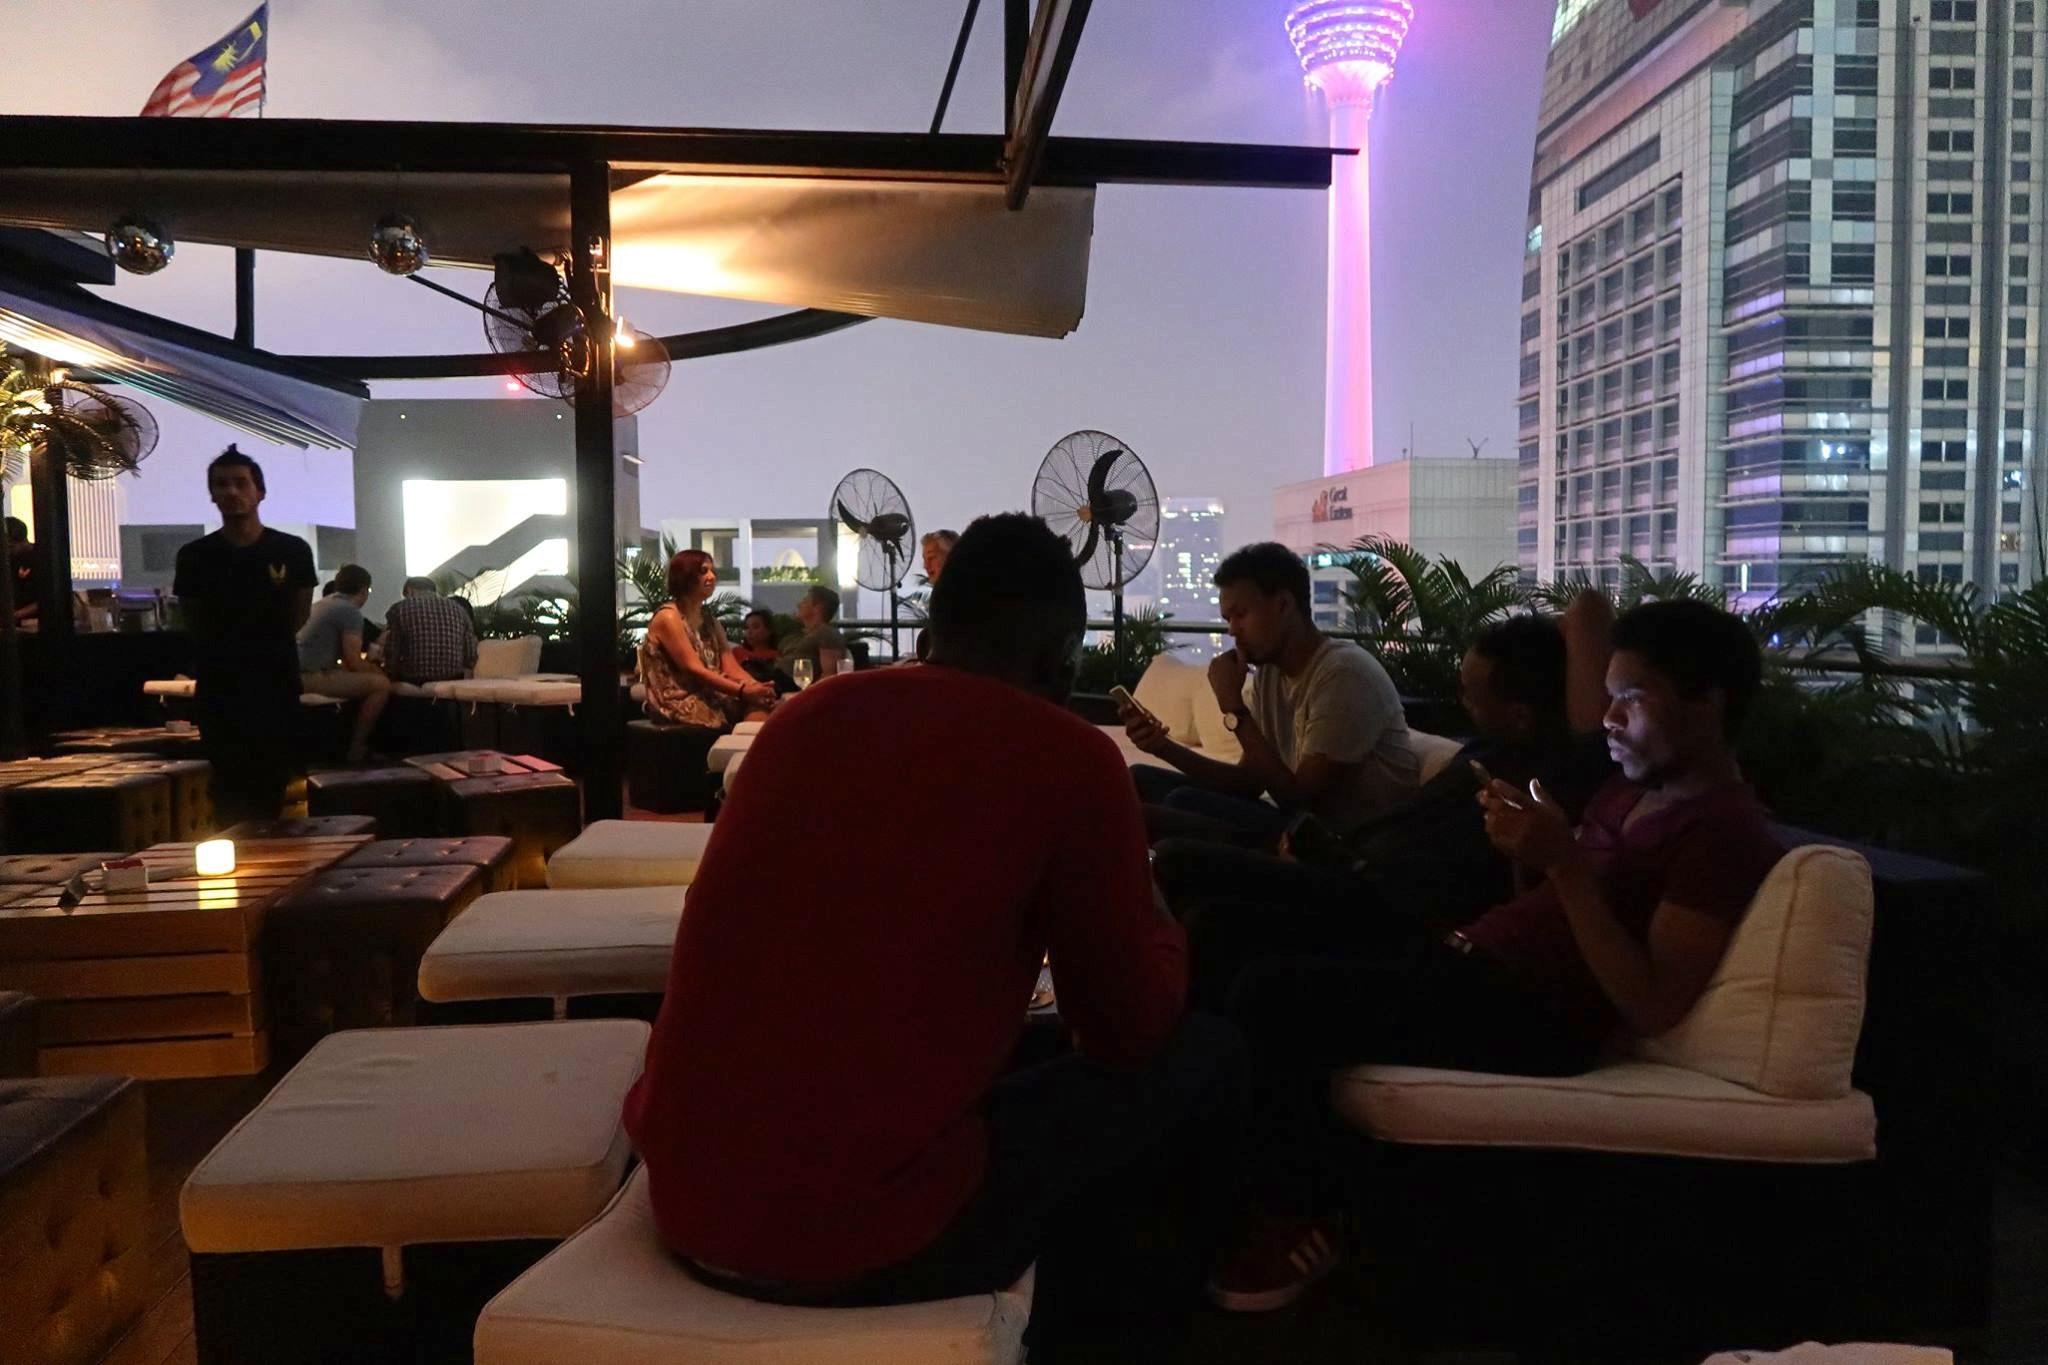 Kuala Lumpur Nightlife Bar/Club Guide : 23/11/17 : The City List